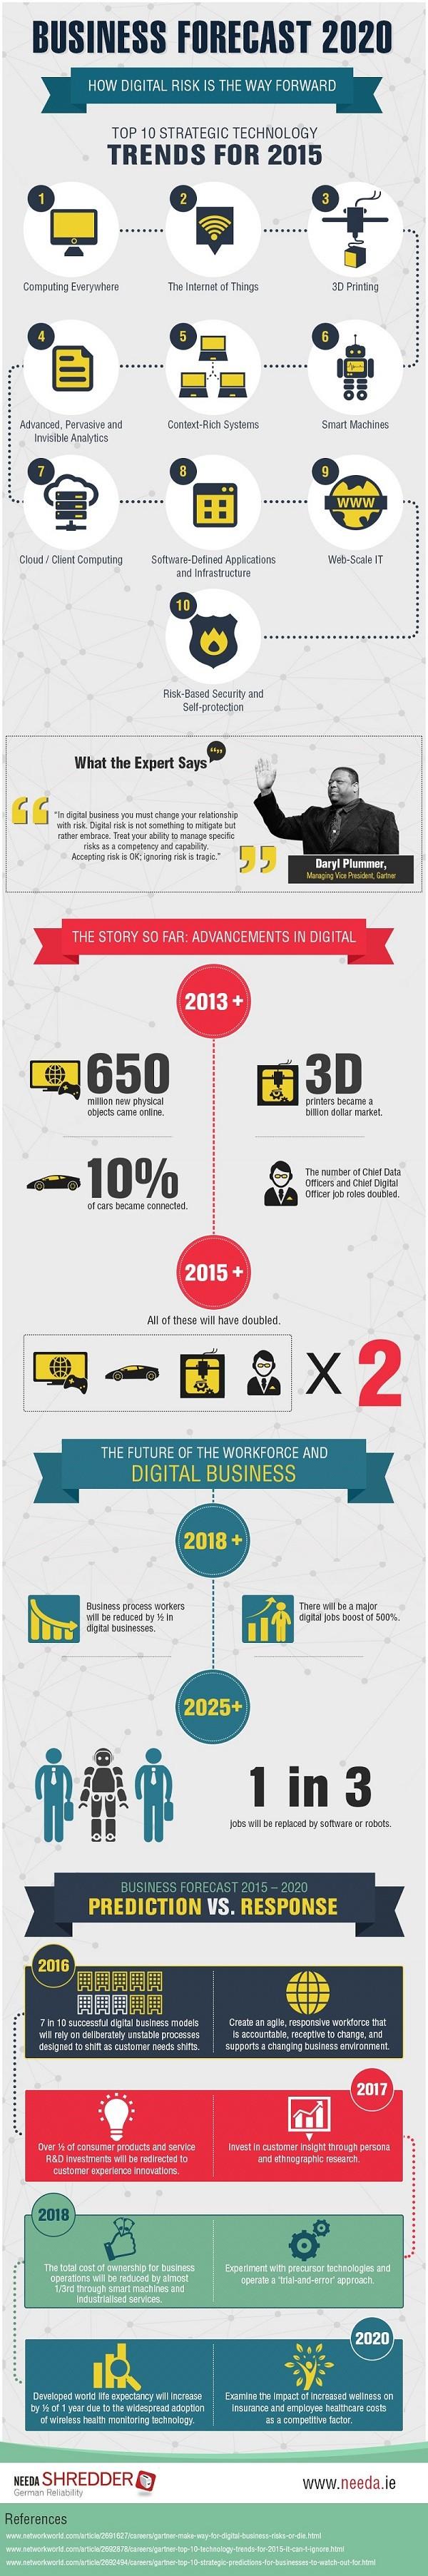 marketing-profs-infographic